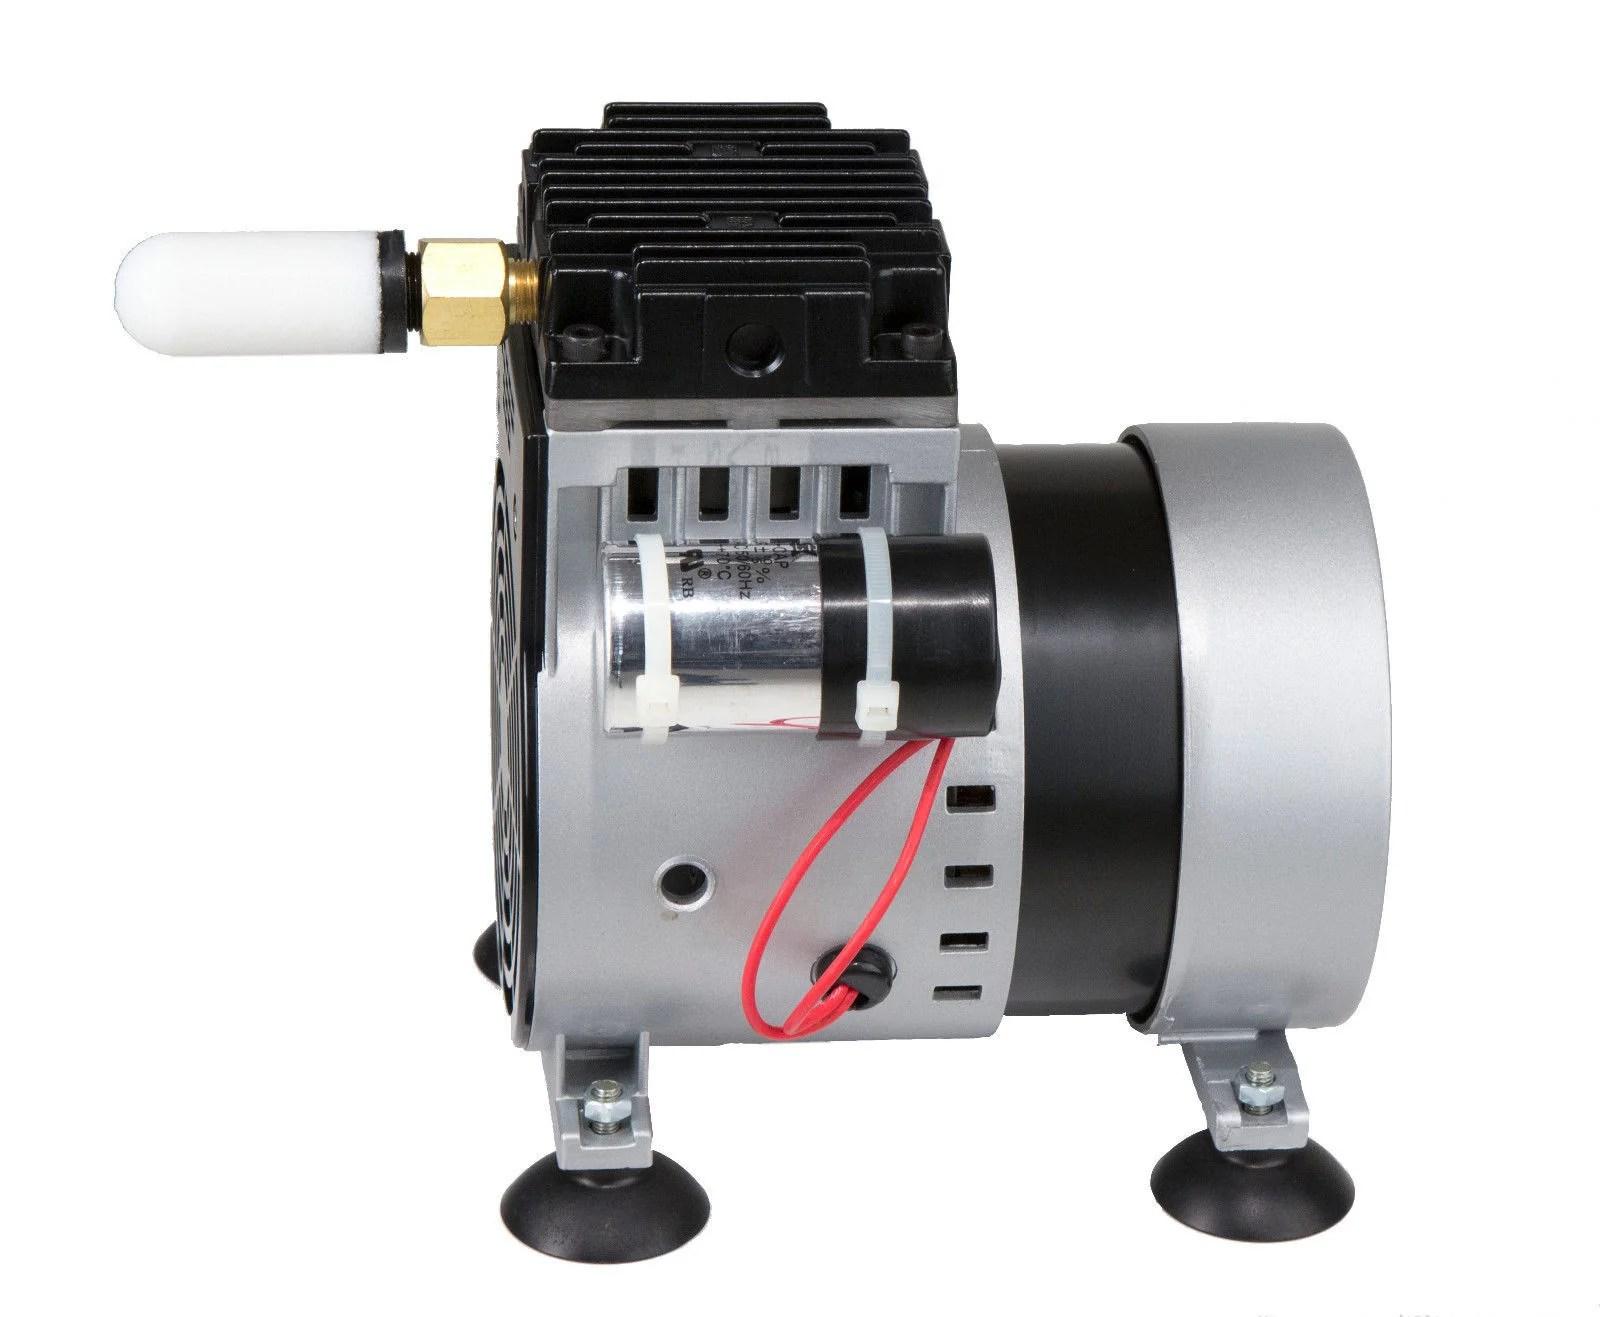 medium resolution of  easypro 1 4 hp rocking piston pond aerator air compressor erp25